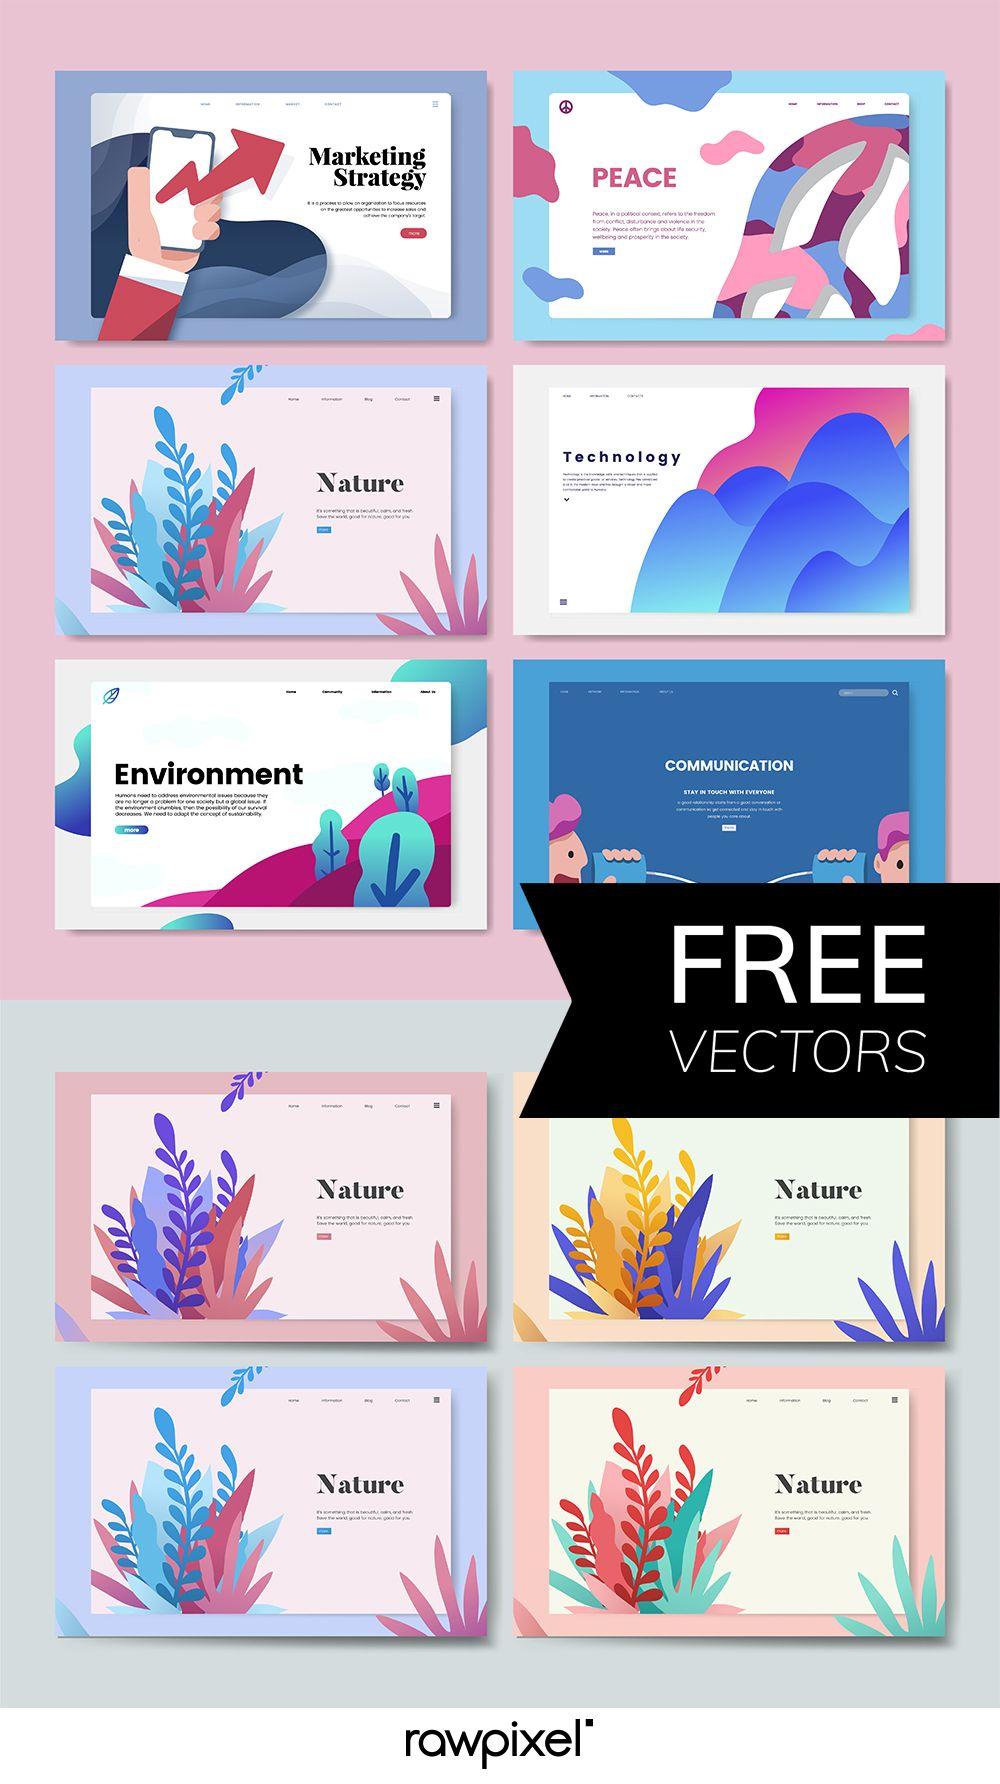 Web Templates Vectors Powerpoint Presentation Design Powerpoint Design Templates Presentation Design